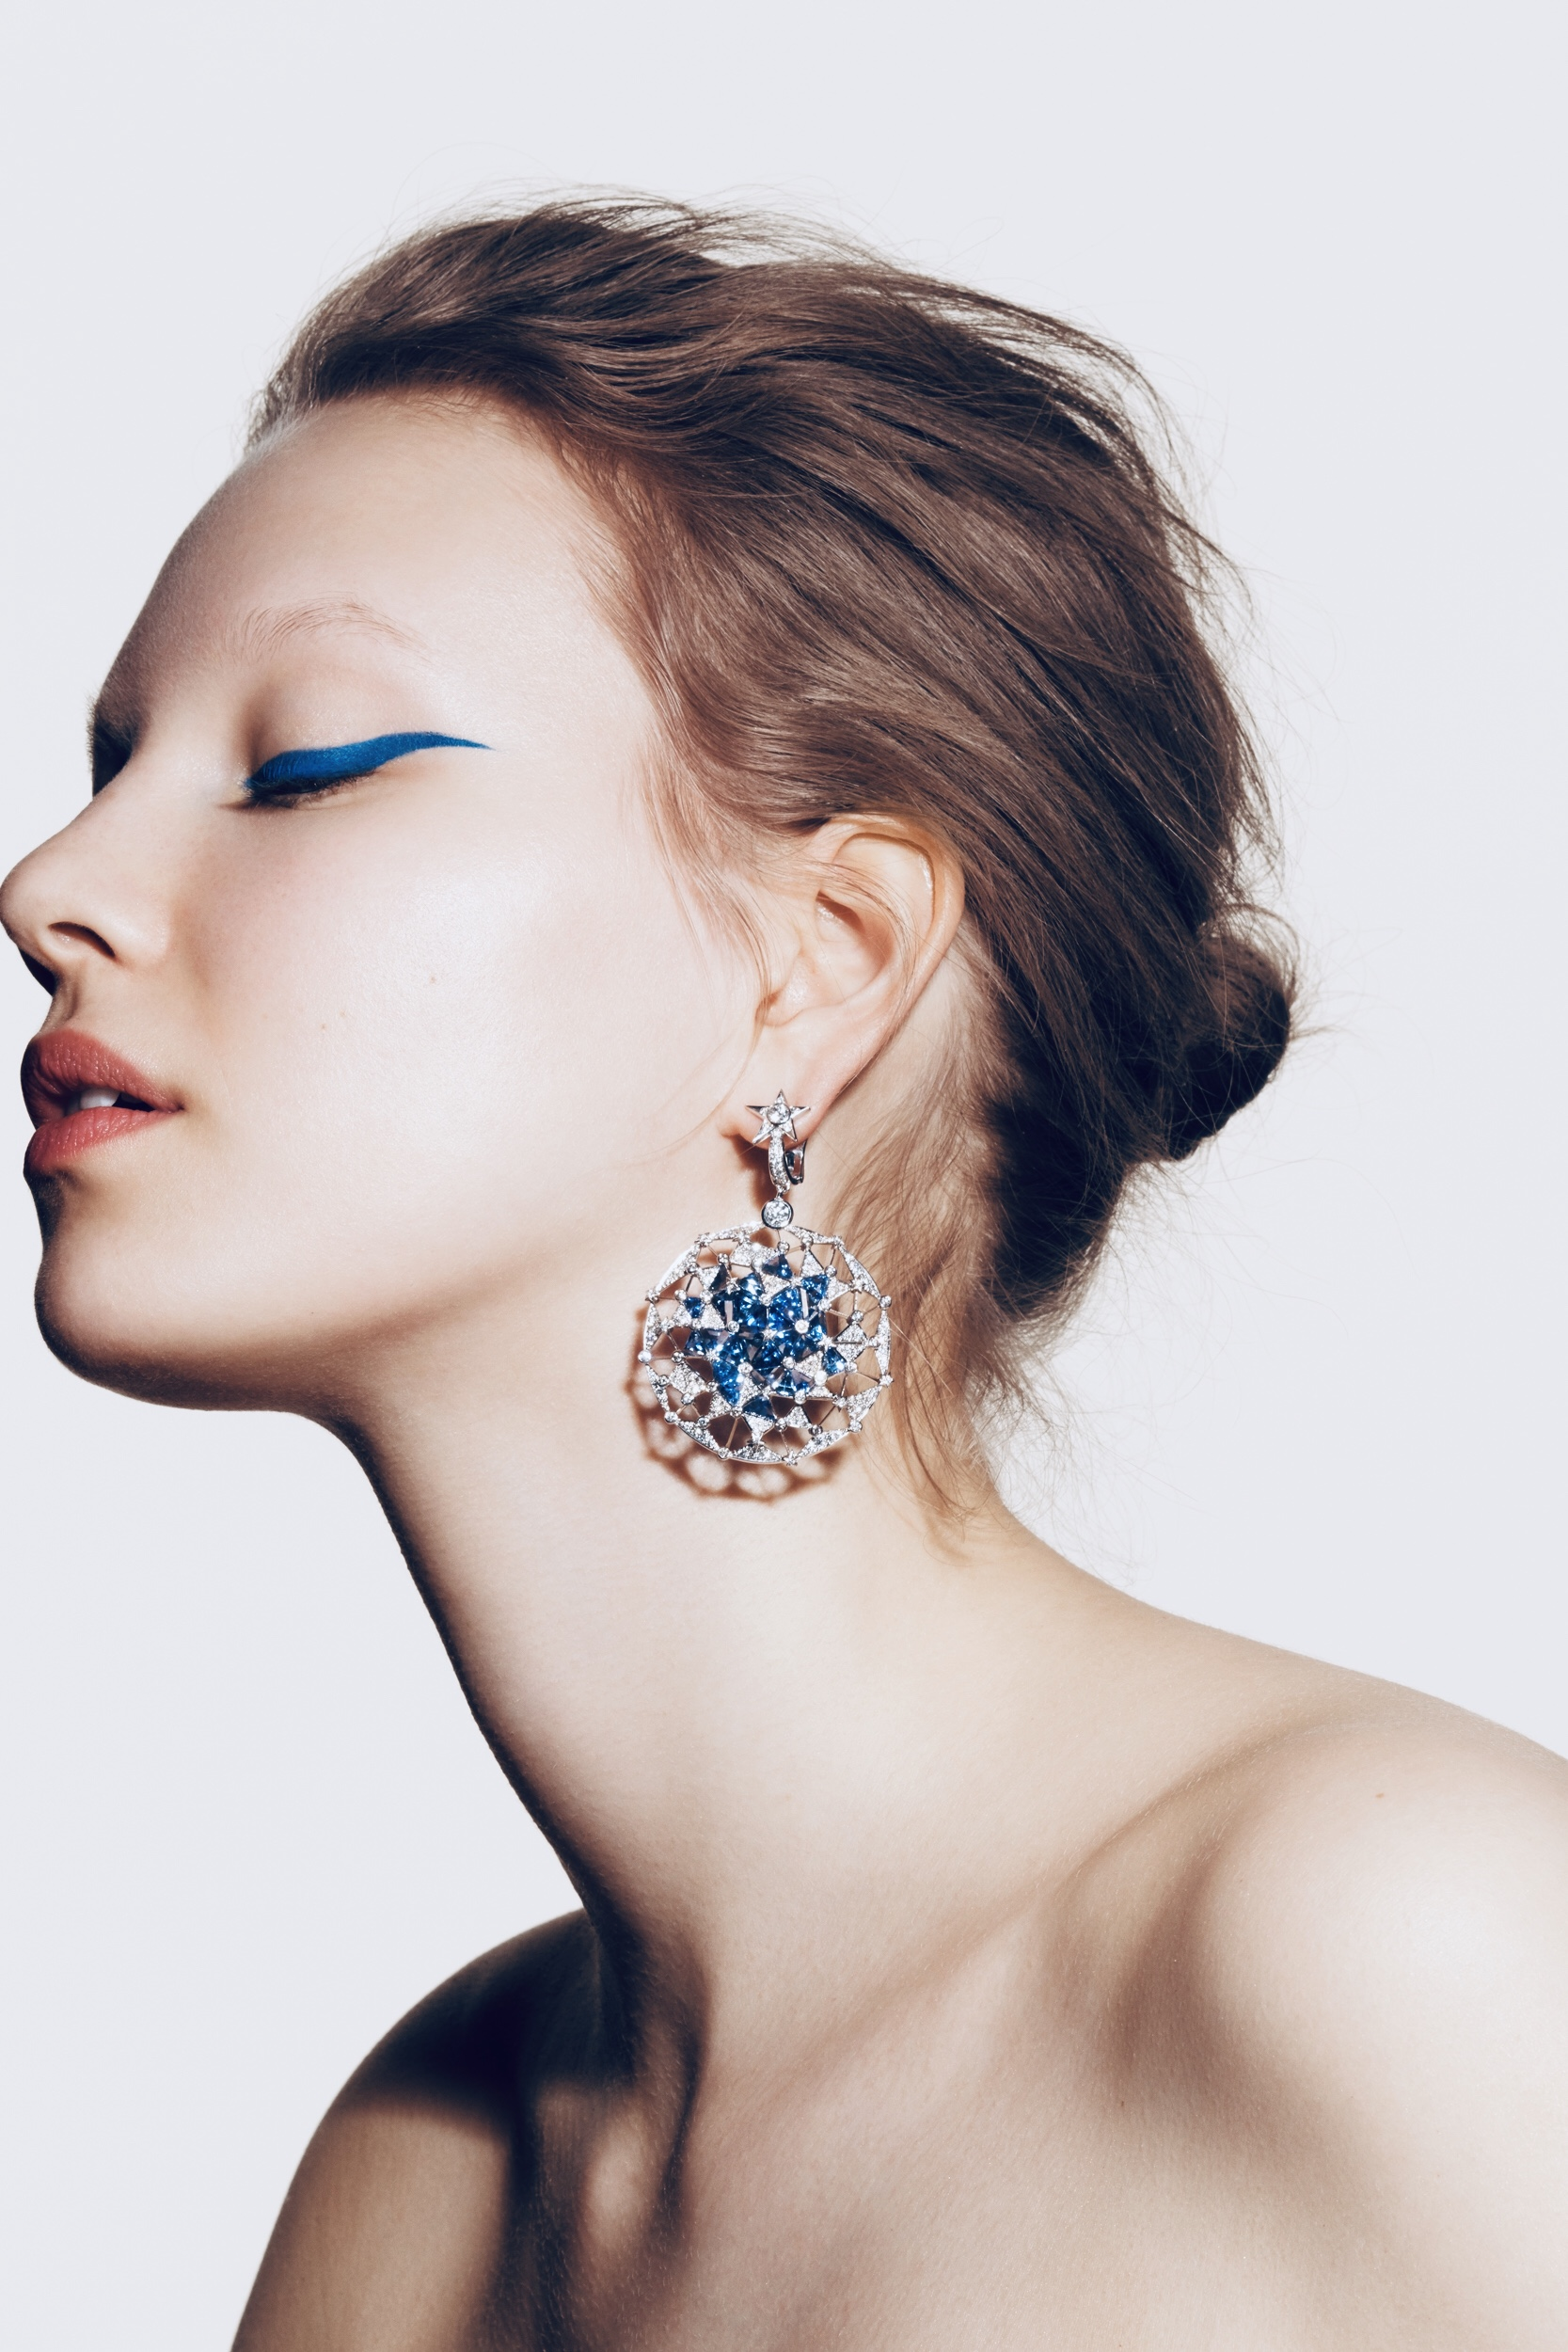 grazia magazine Big Fashion Beauty Shoot